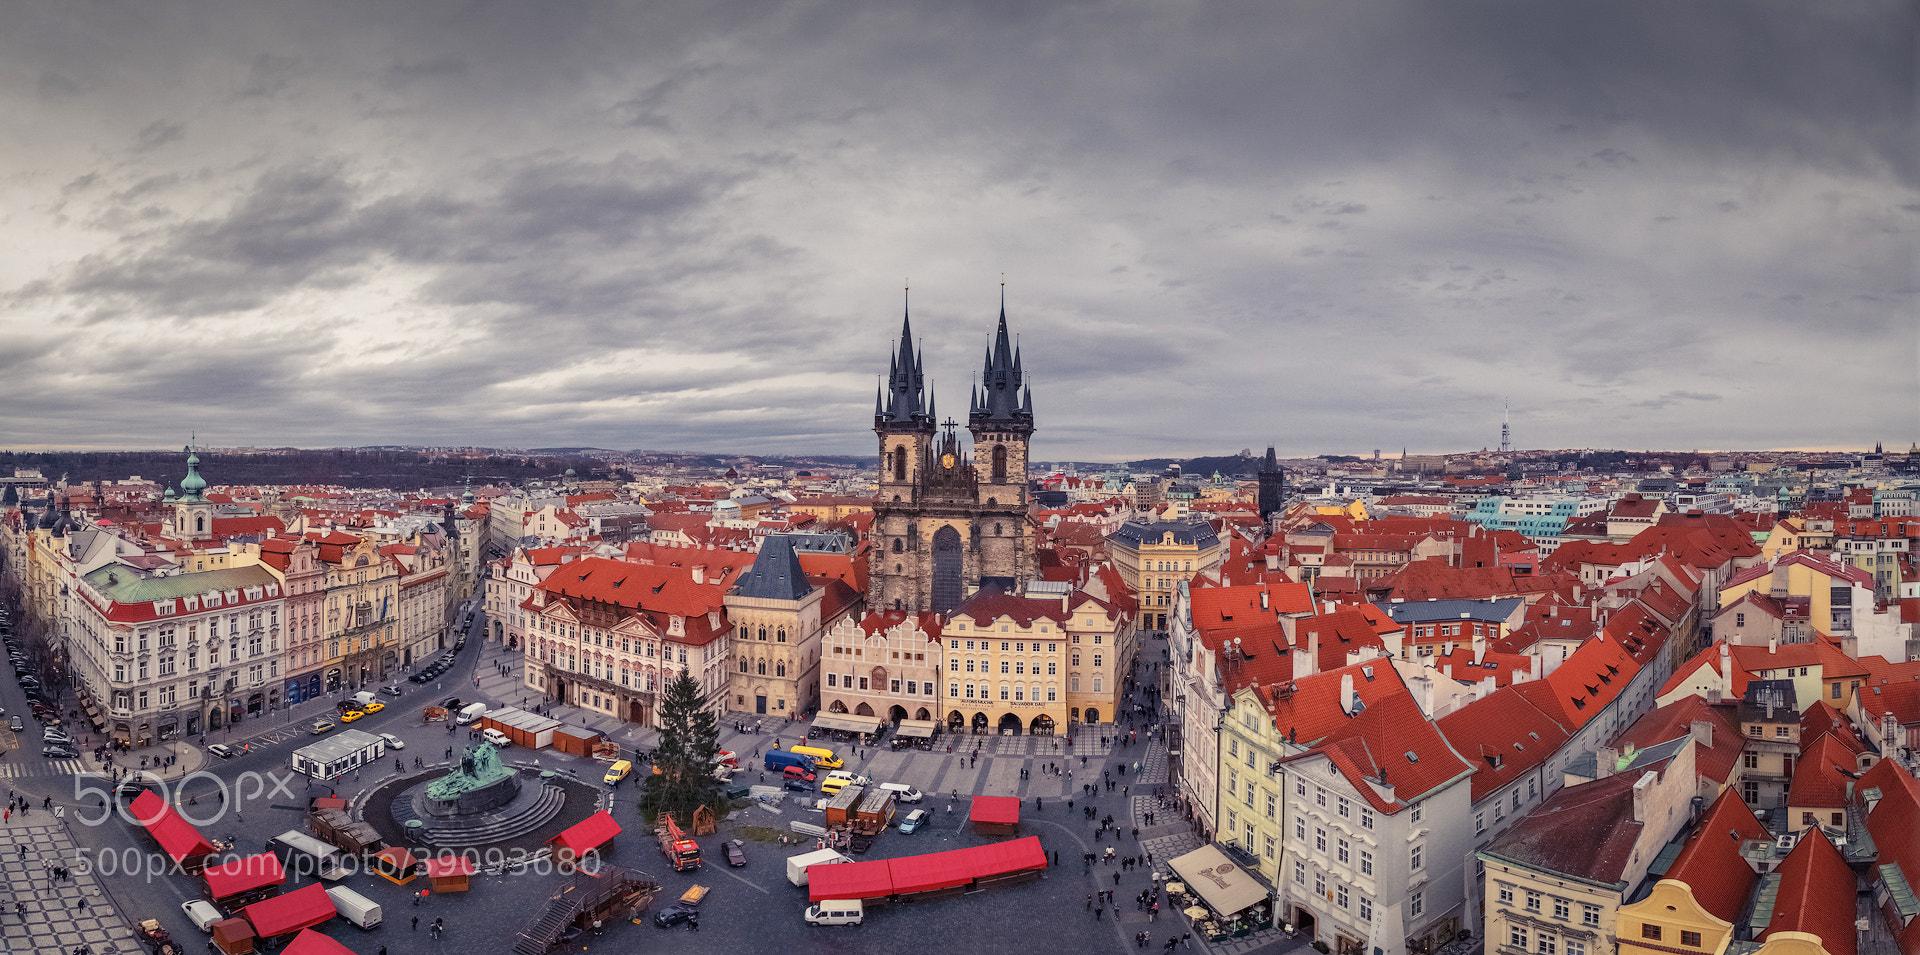 Photograph Prague by Vladimir Vodyanickii on 500px